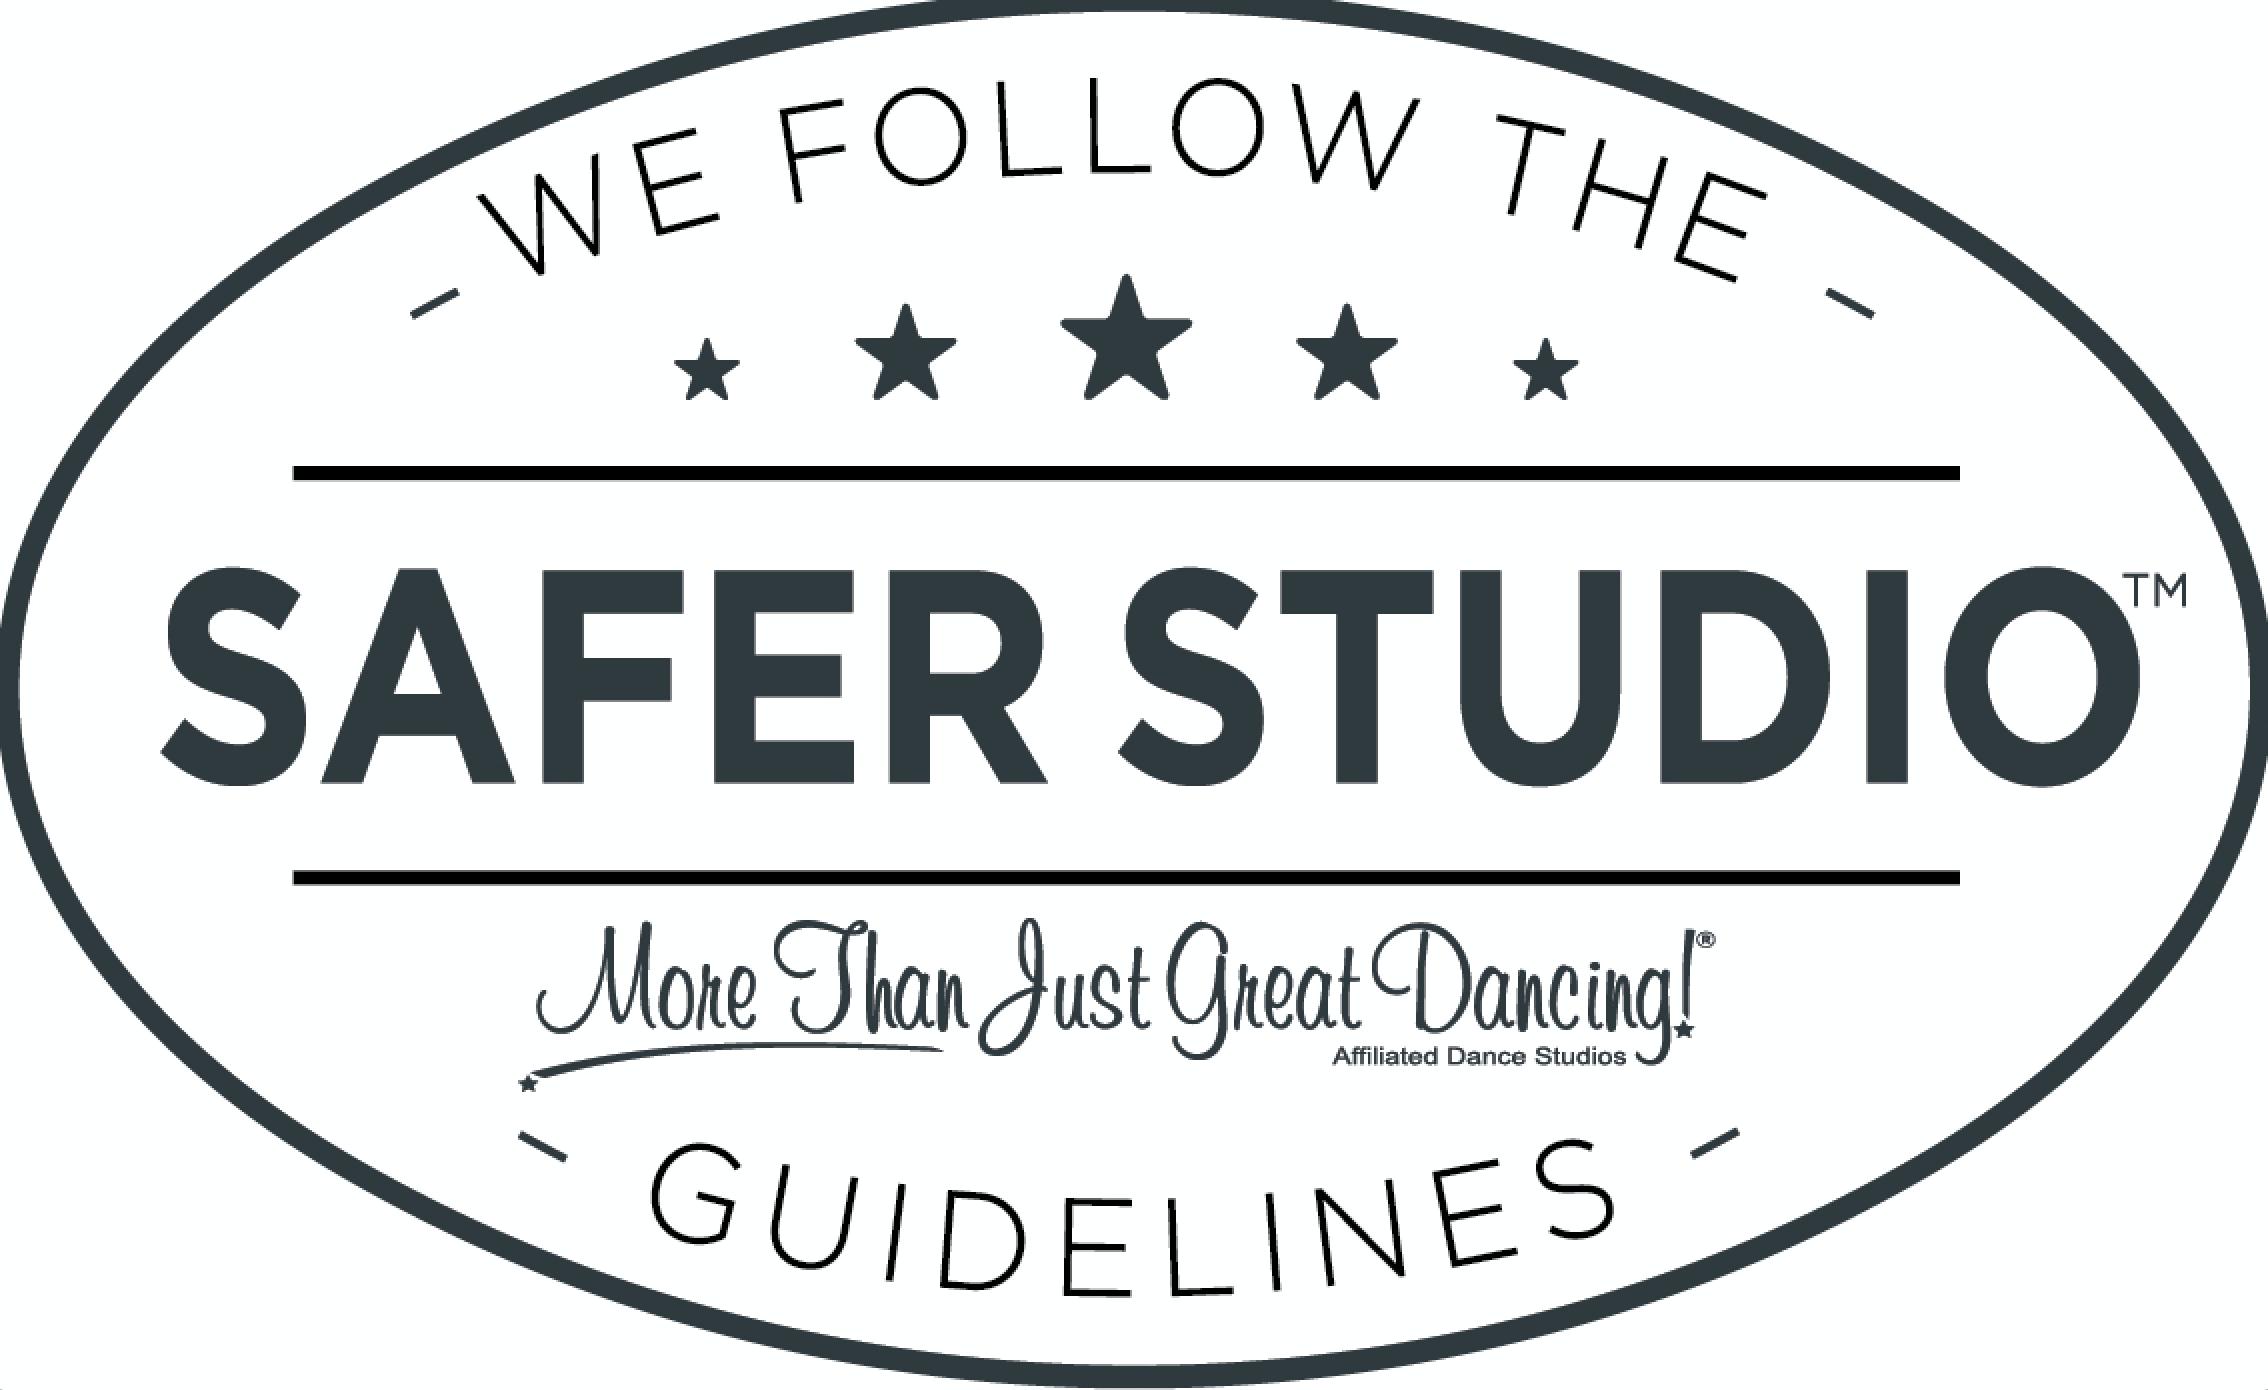 Safer Studio Always